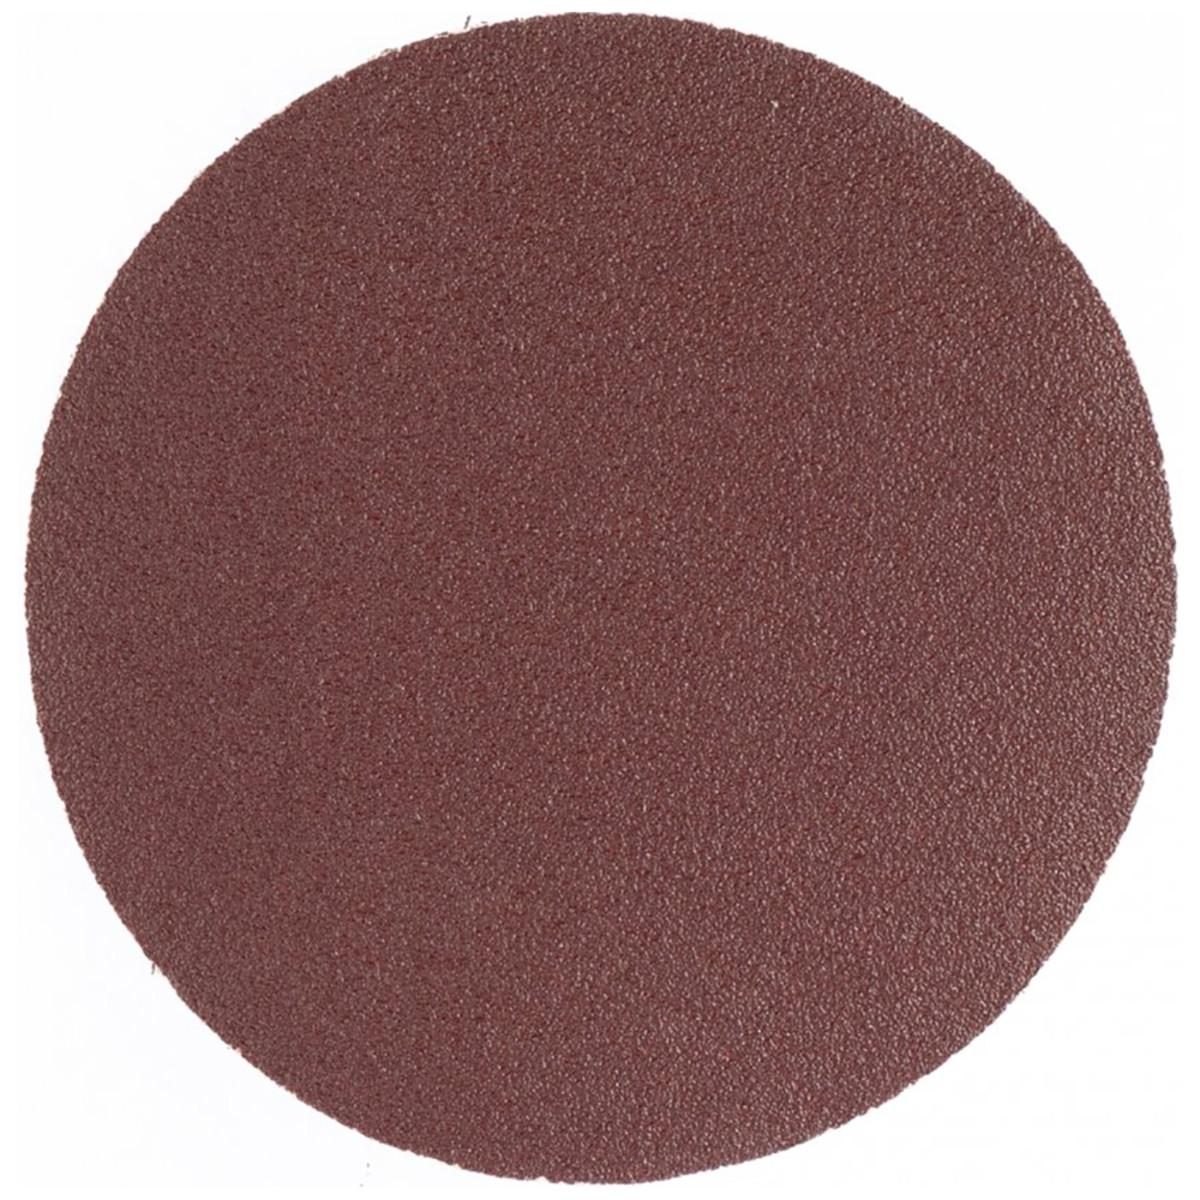 Круг абразивный для шлифмашин КЕДР 115 мм 043-0060